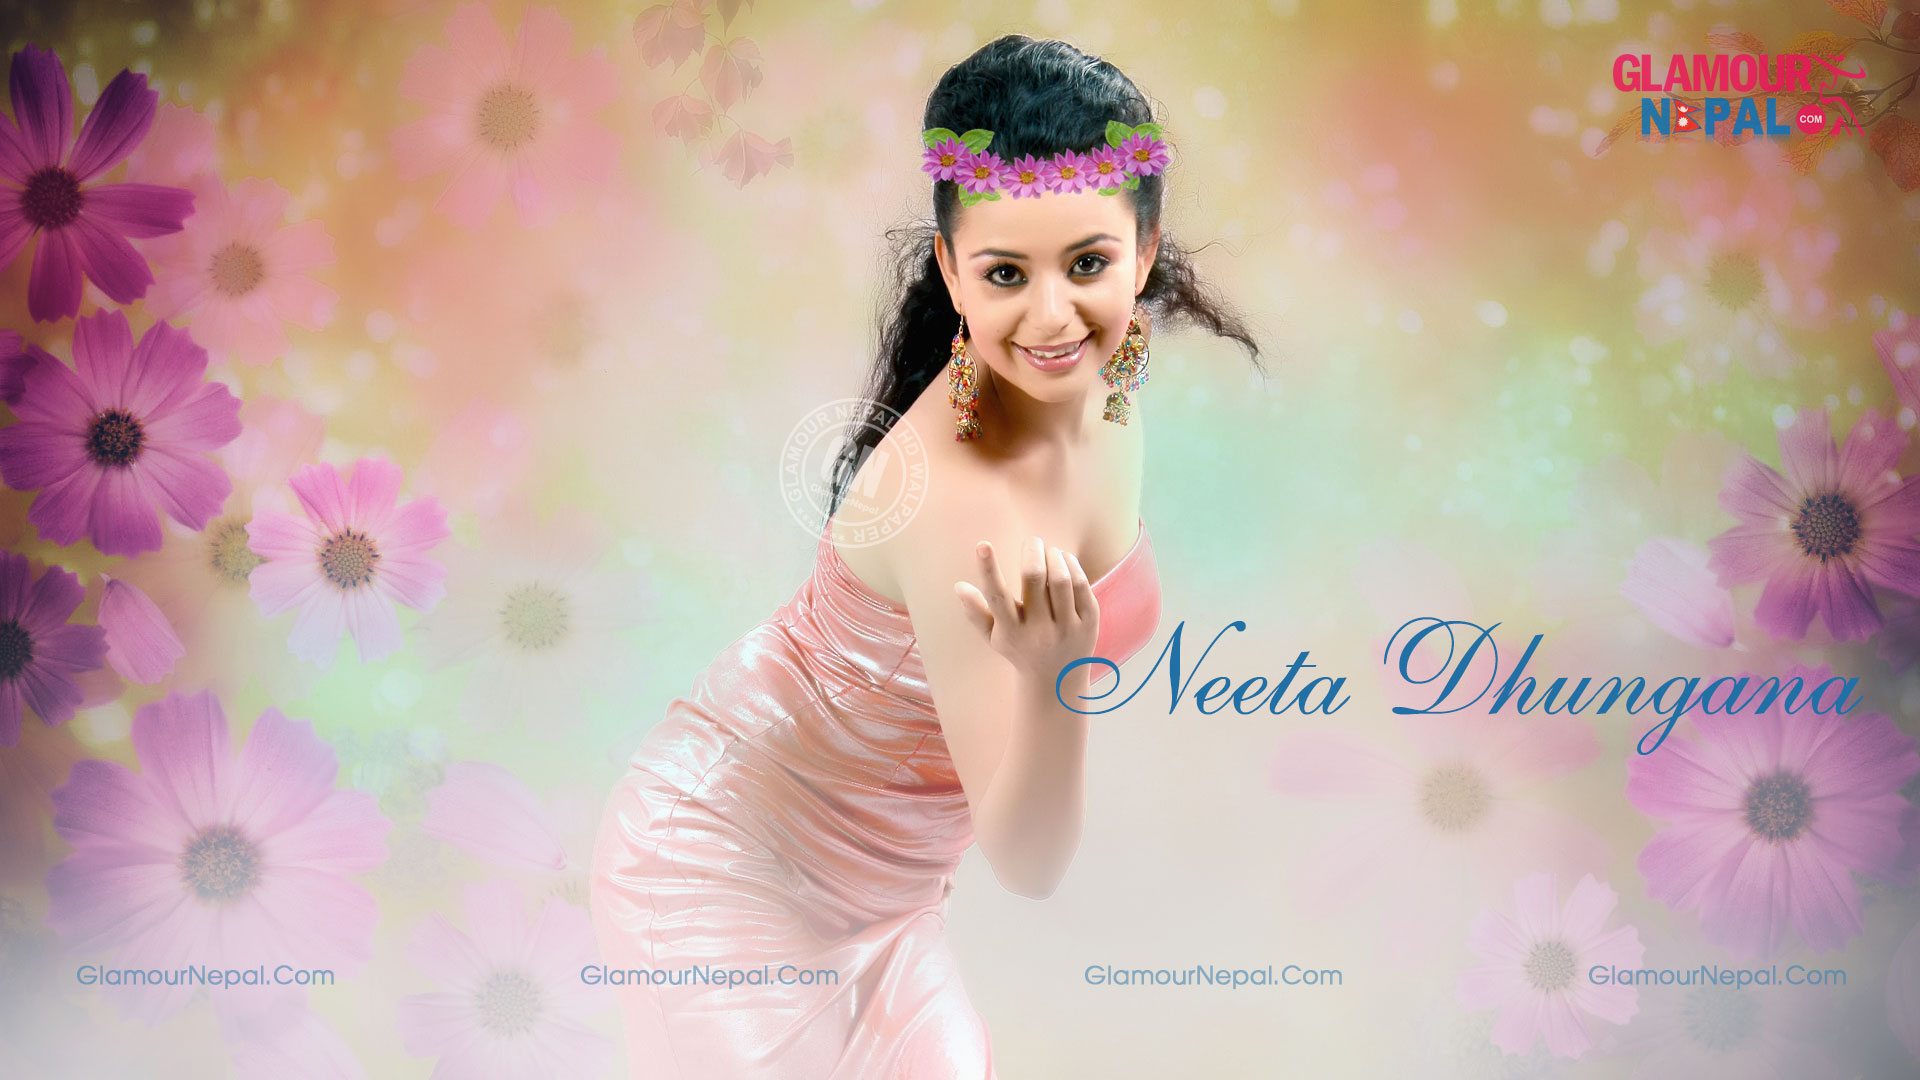 Nepali-Actress-Neeta-Dhungana-HD-Wallpaper-1920x1080-Free-Download